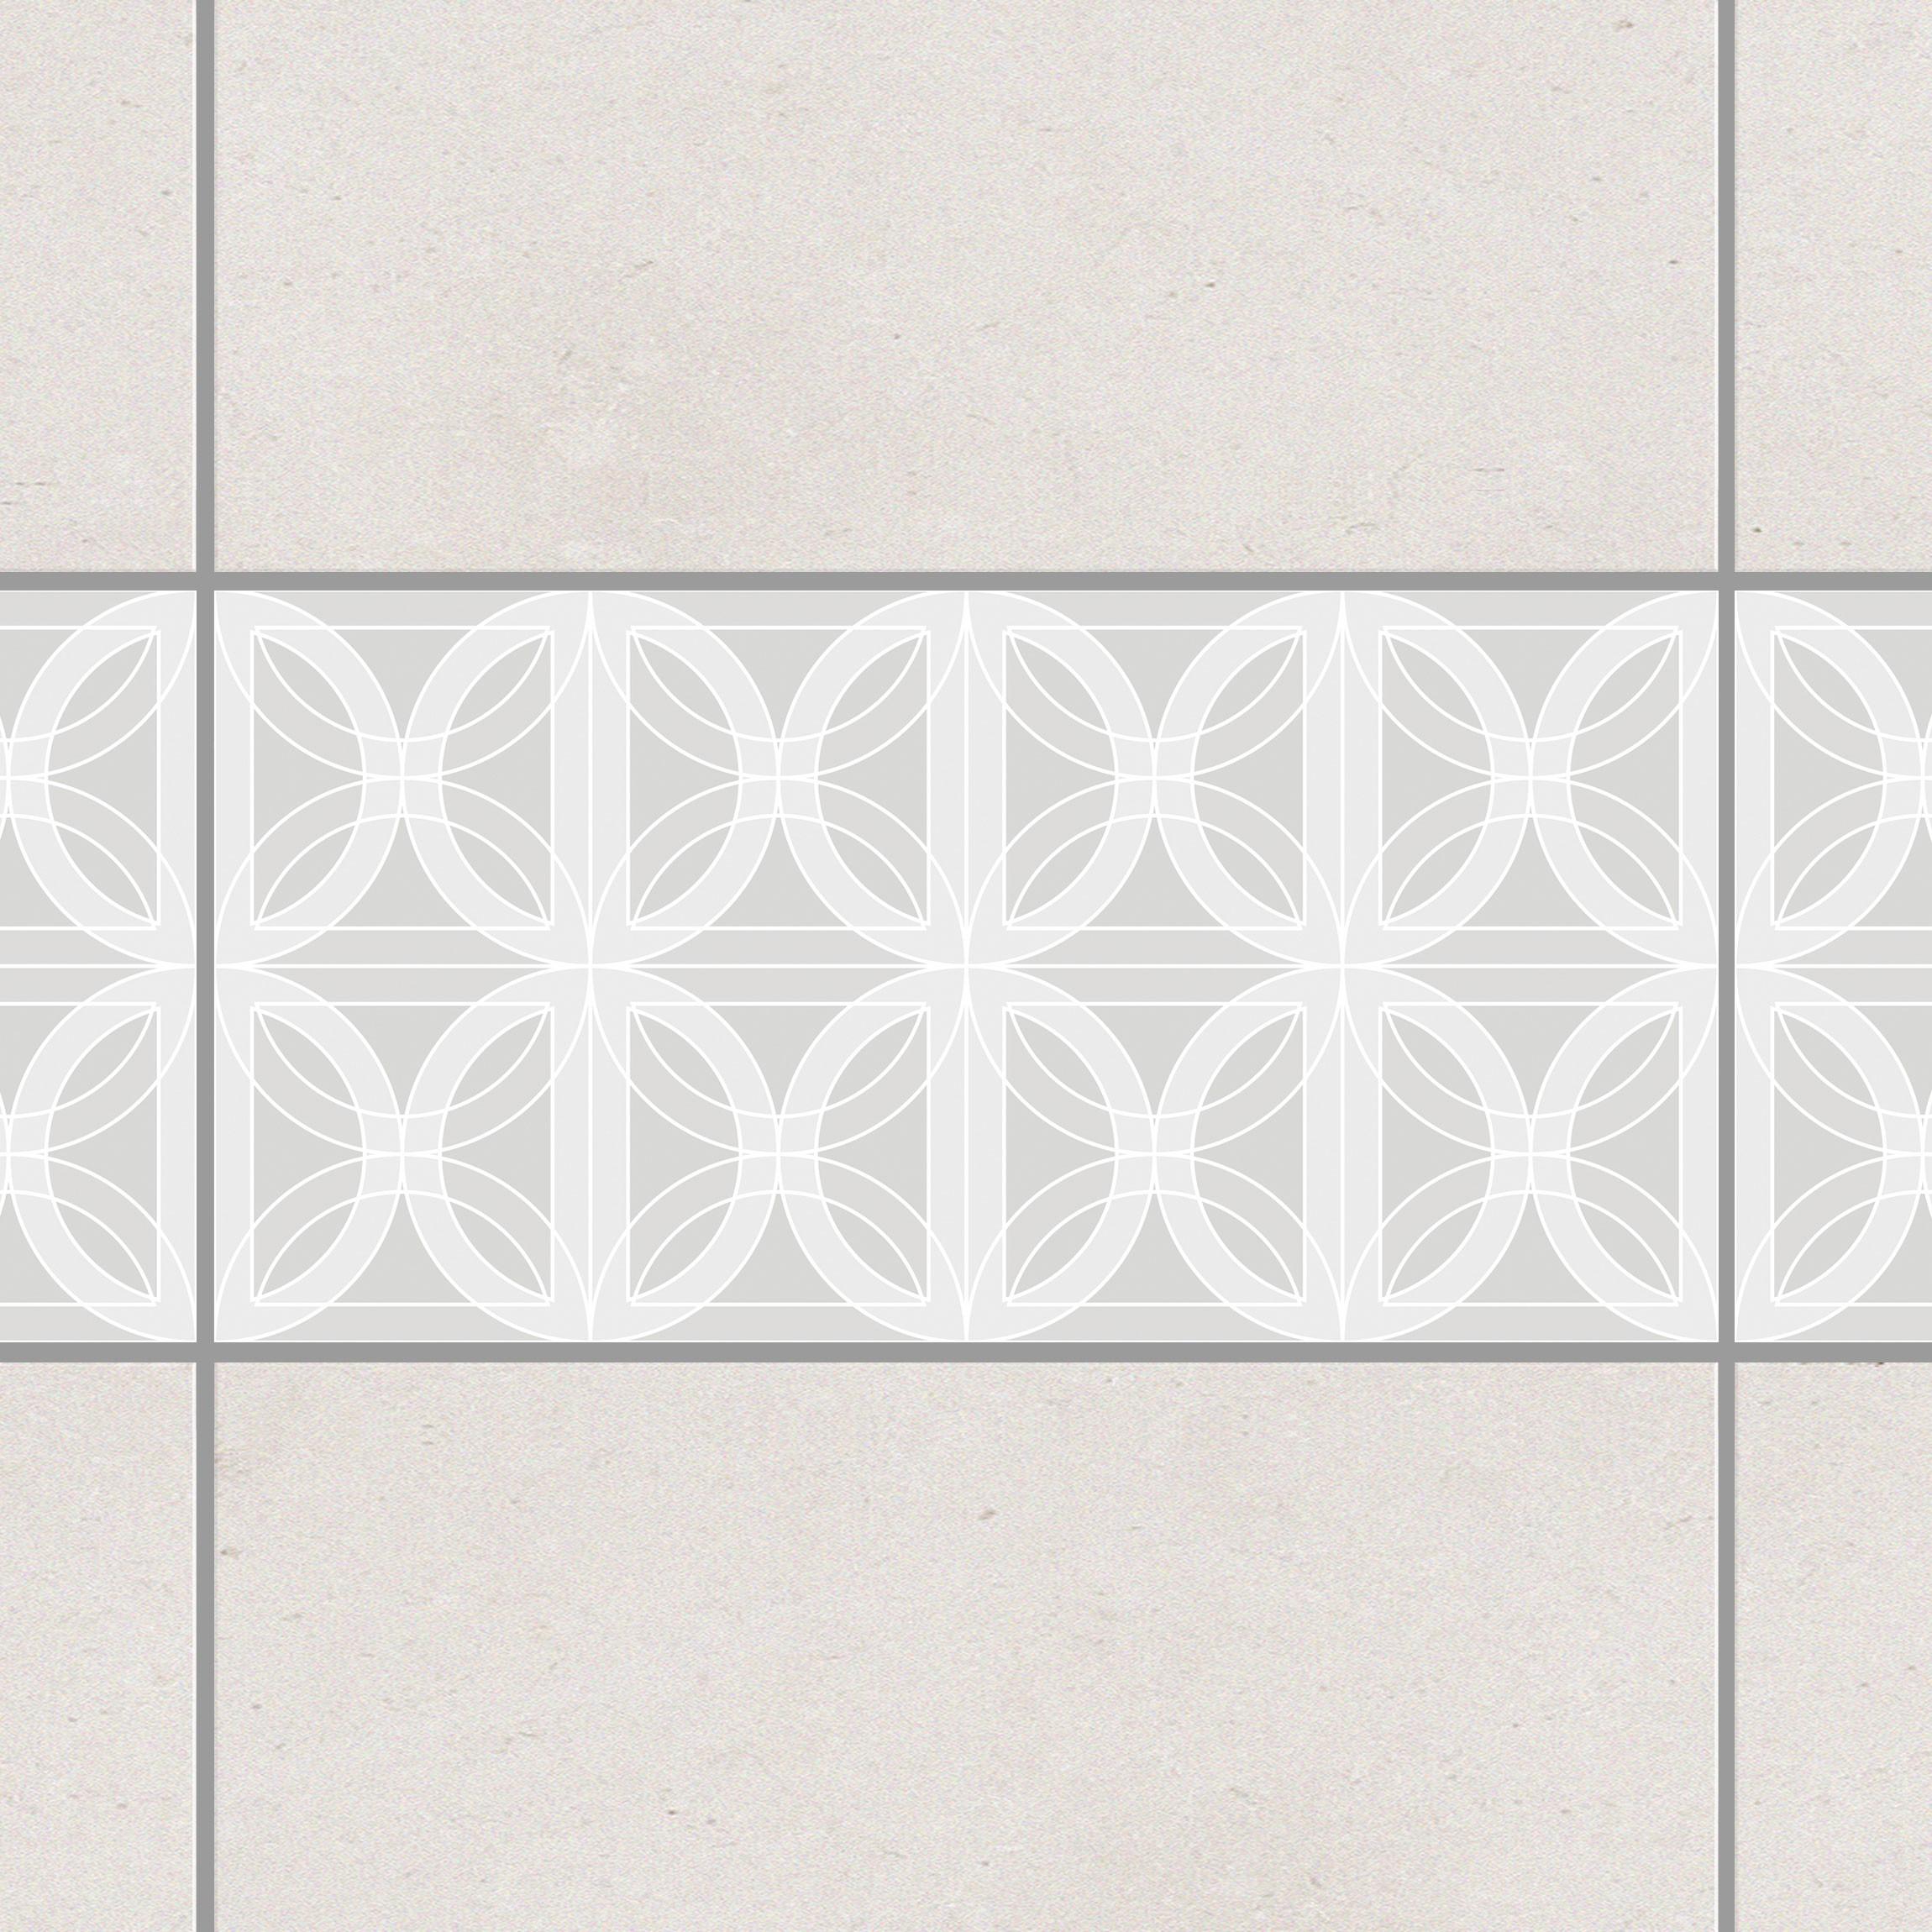 fliesen bord re kreisf rmiges fliesendesign light grey 30x60 cm fliesenaufkleber grau. Black Bedroom Furniture Sets. Home Design Ideas